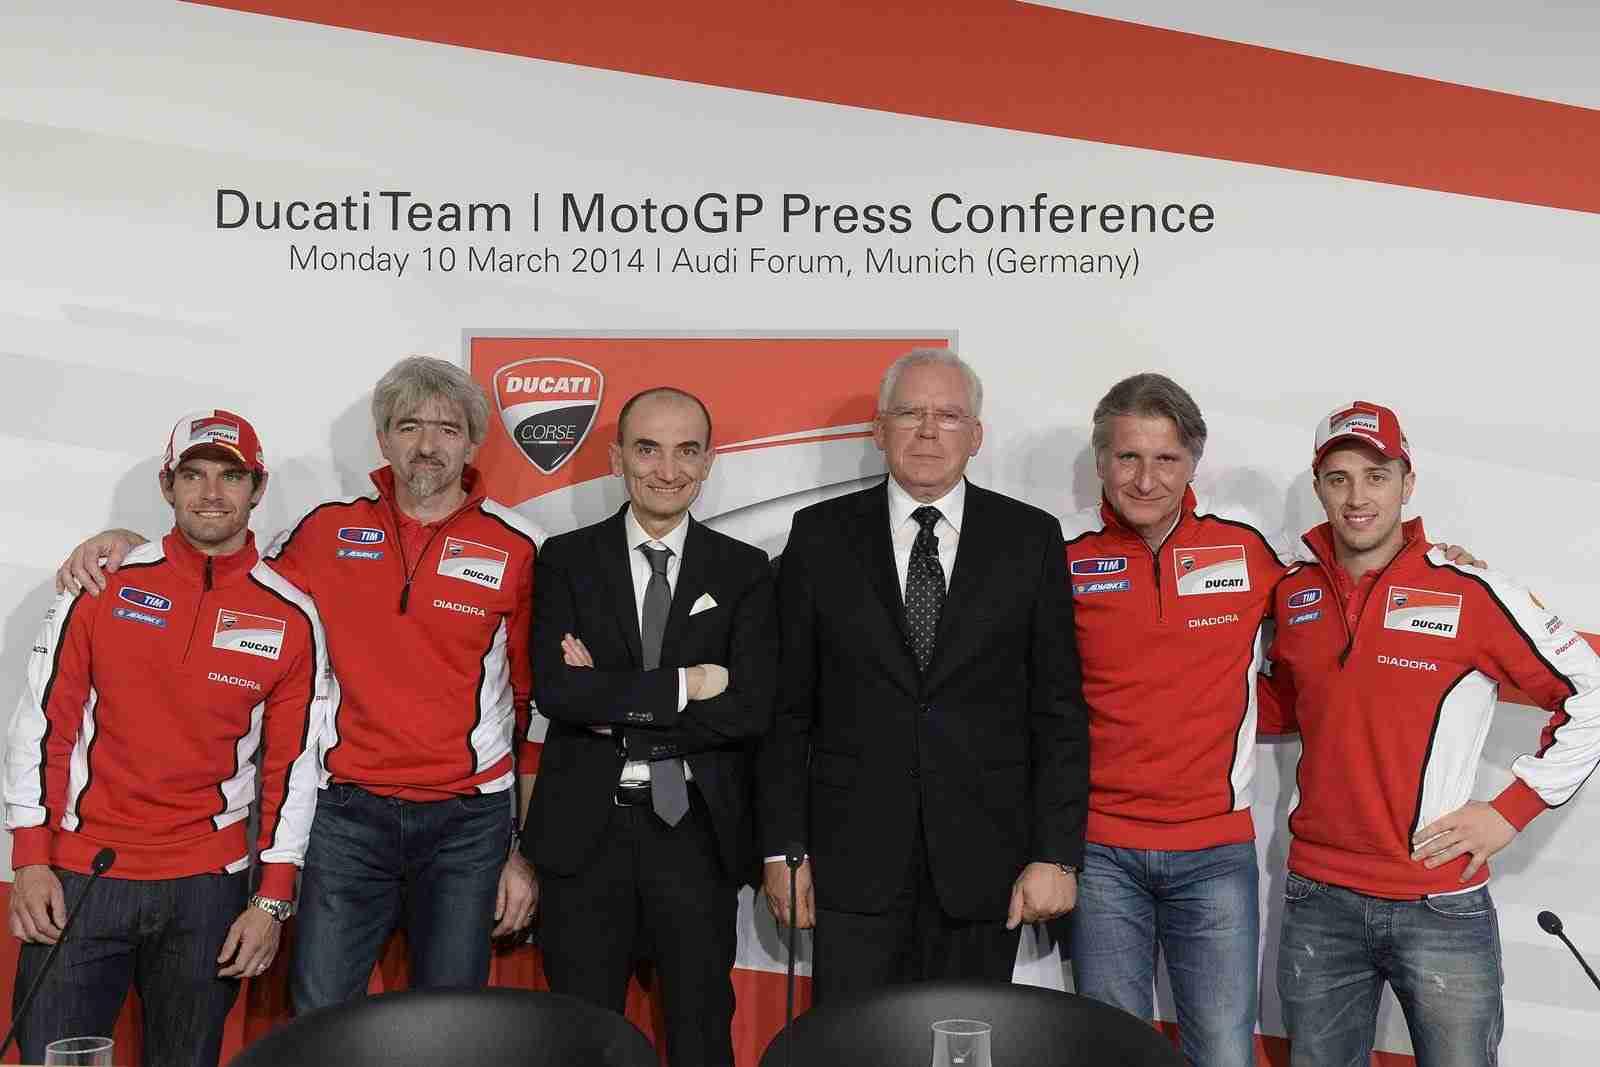 Ducati MotoGP team 2014